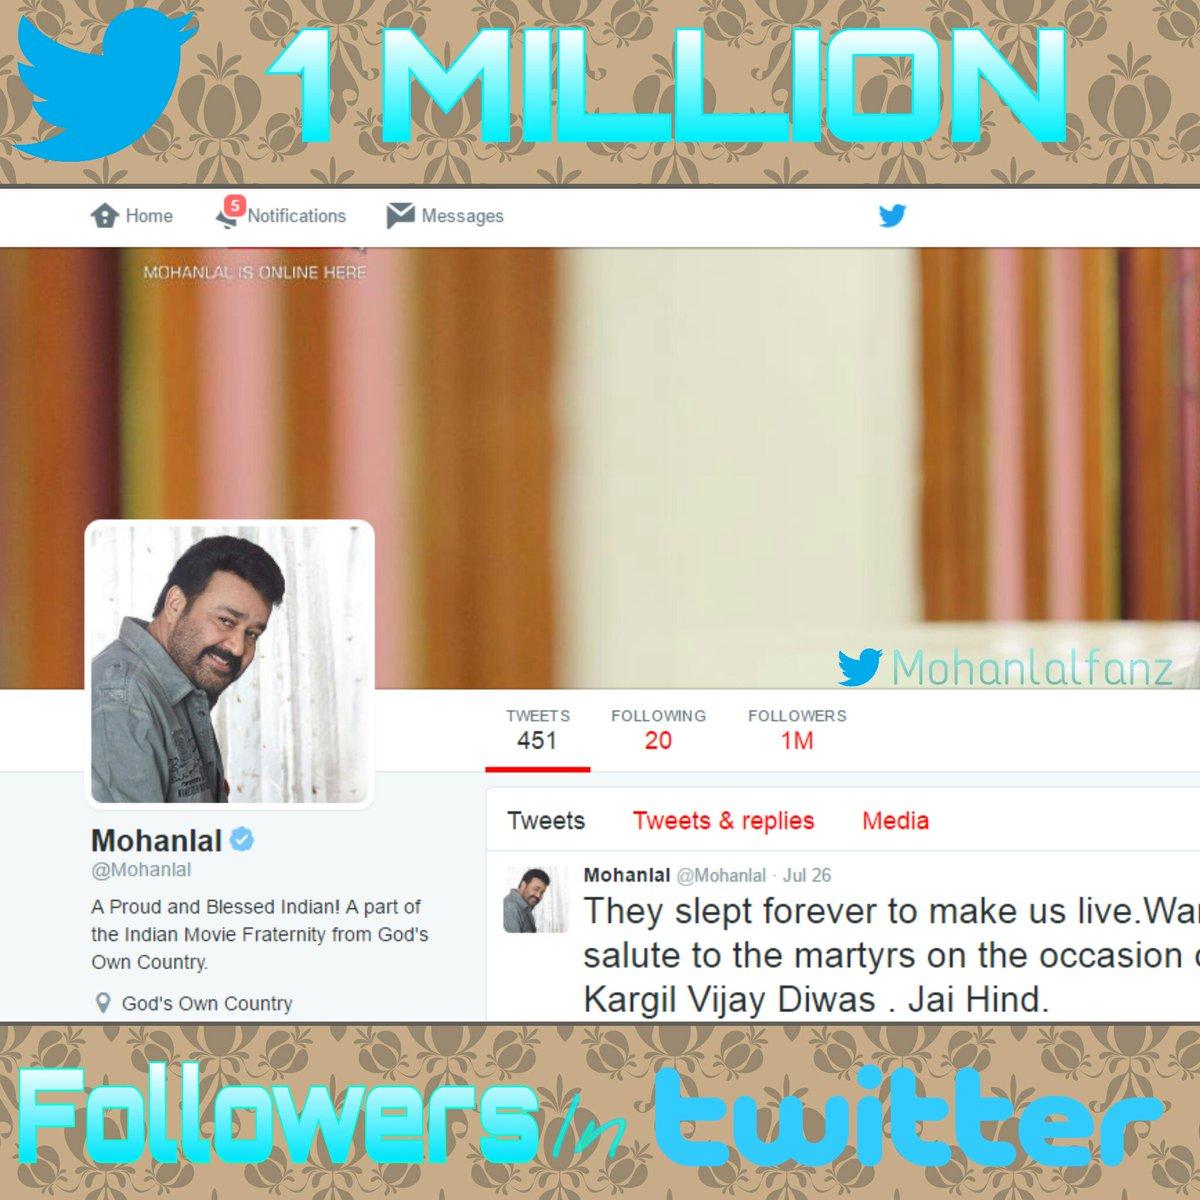 Mohanlal Crosses 1 Million Followers On Twitter